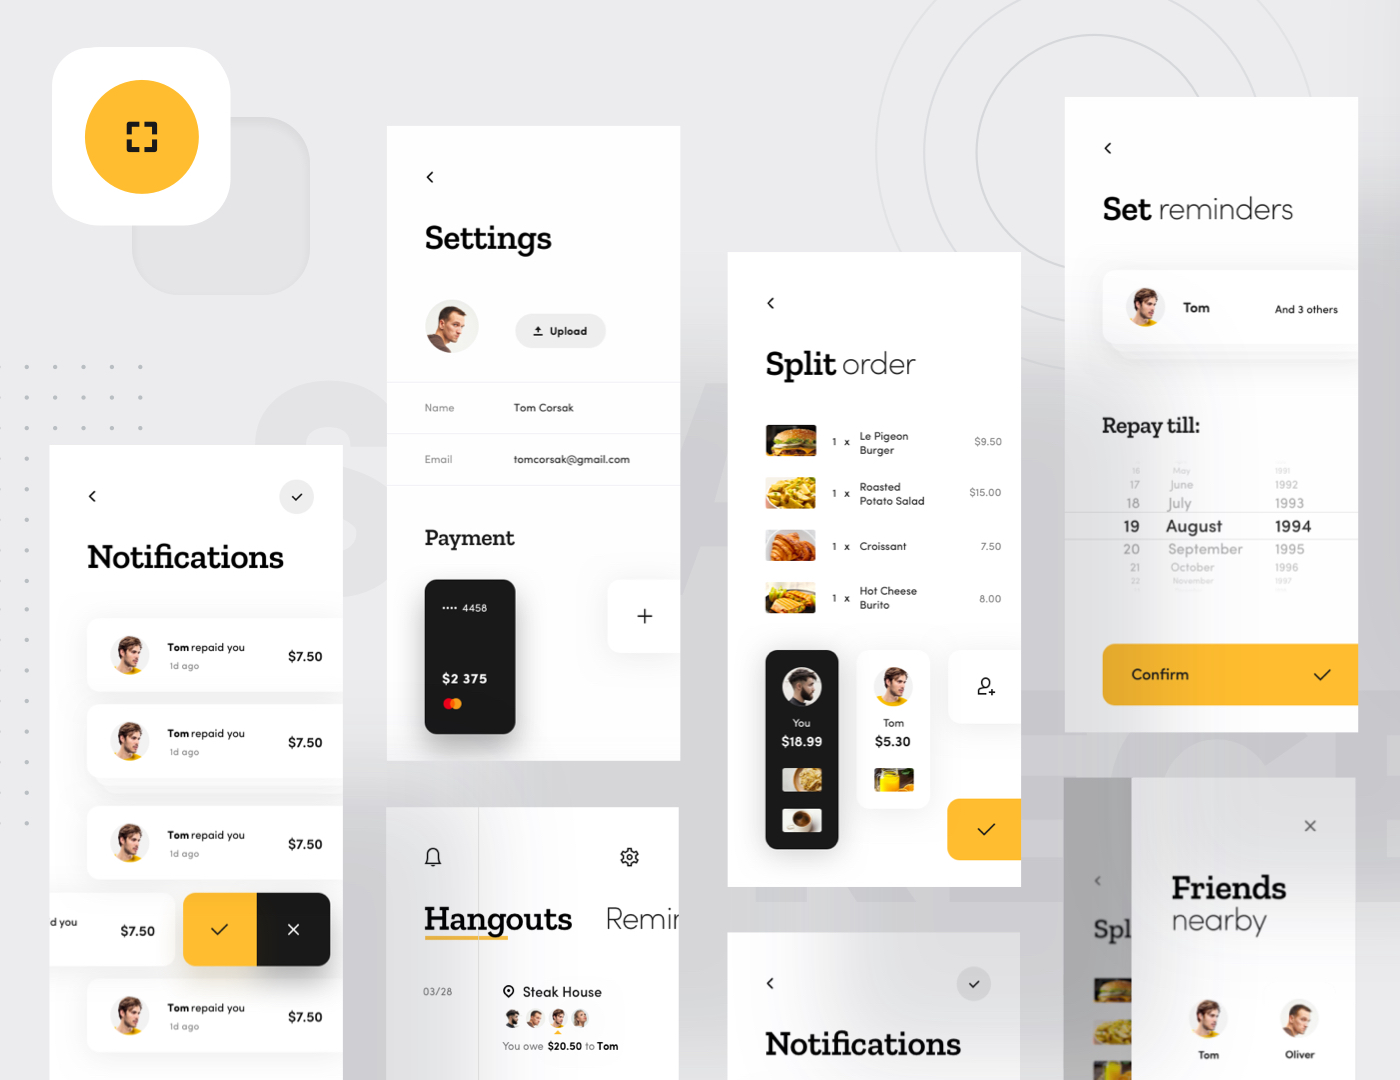 Hango mobile application preview image